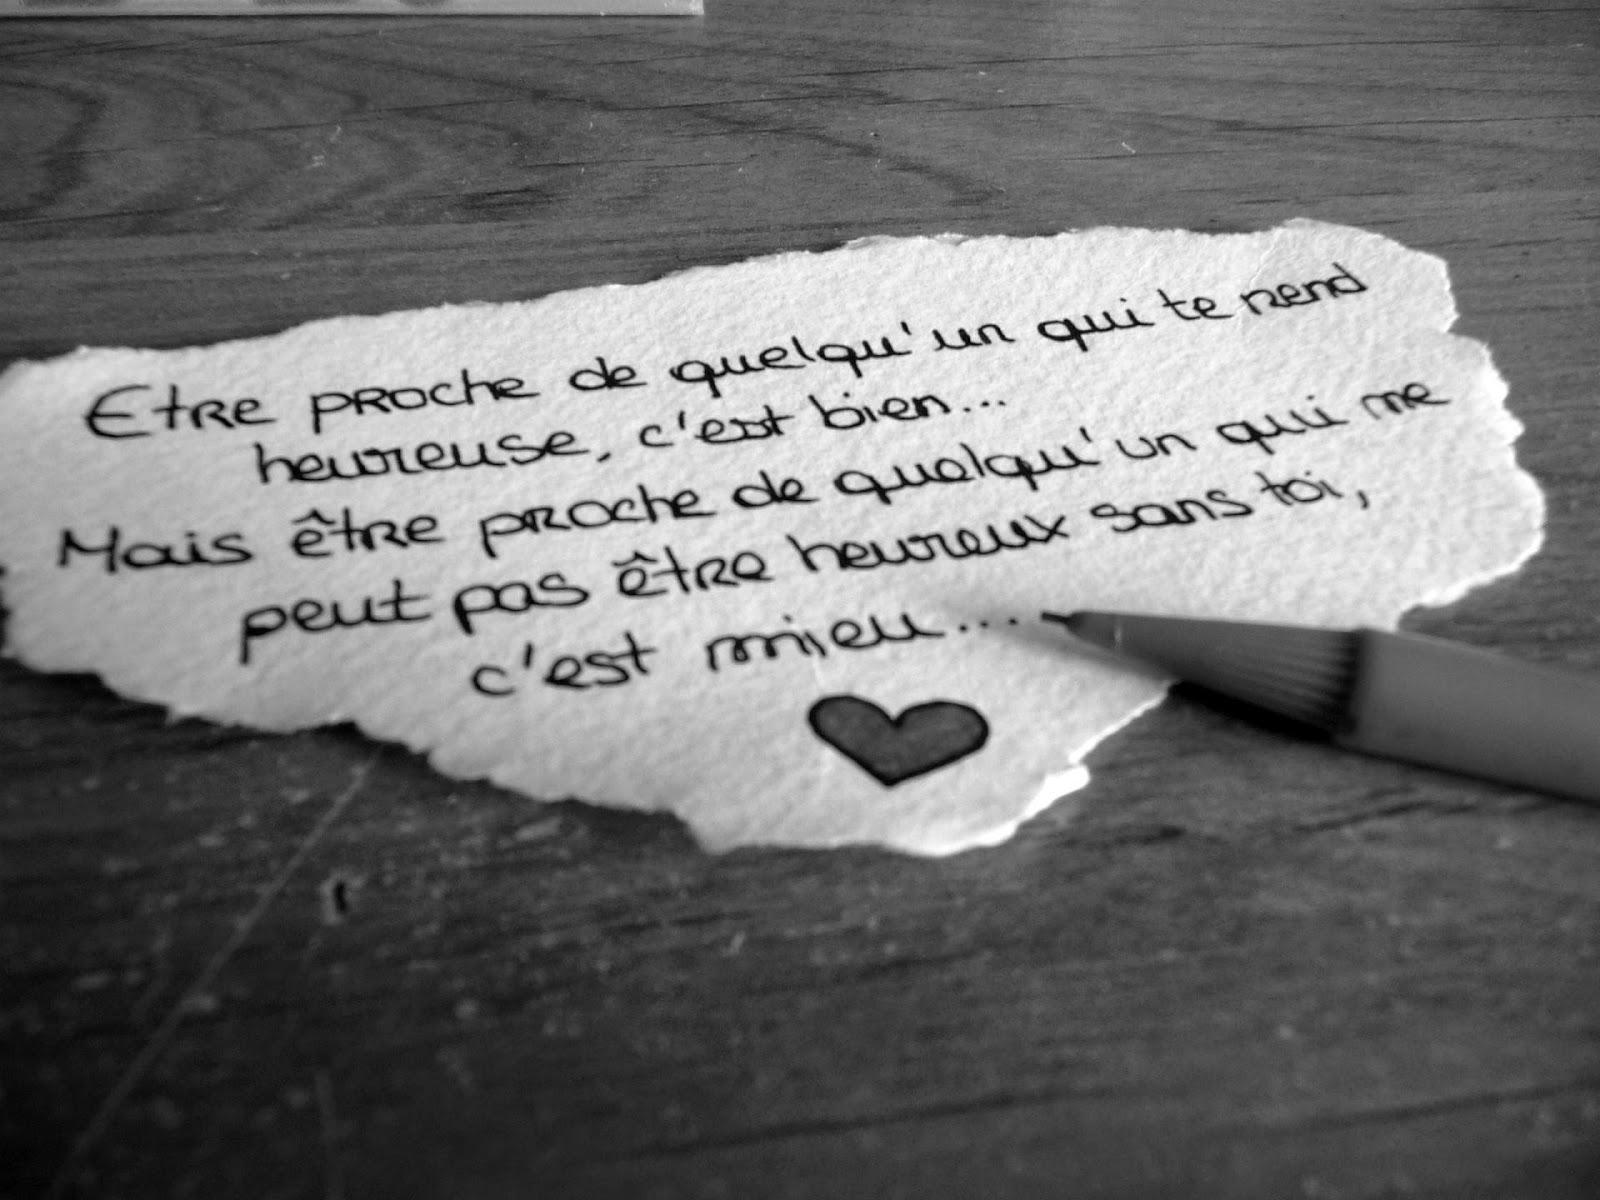 Frases Bonitas De Amor Curtas Frases